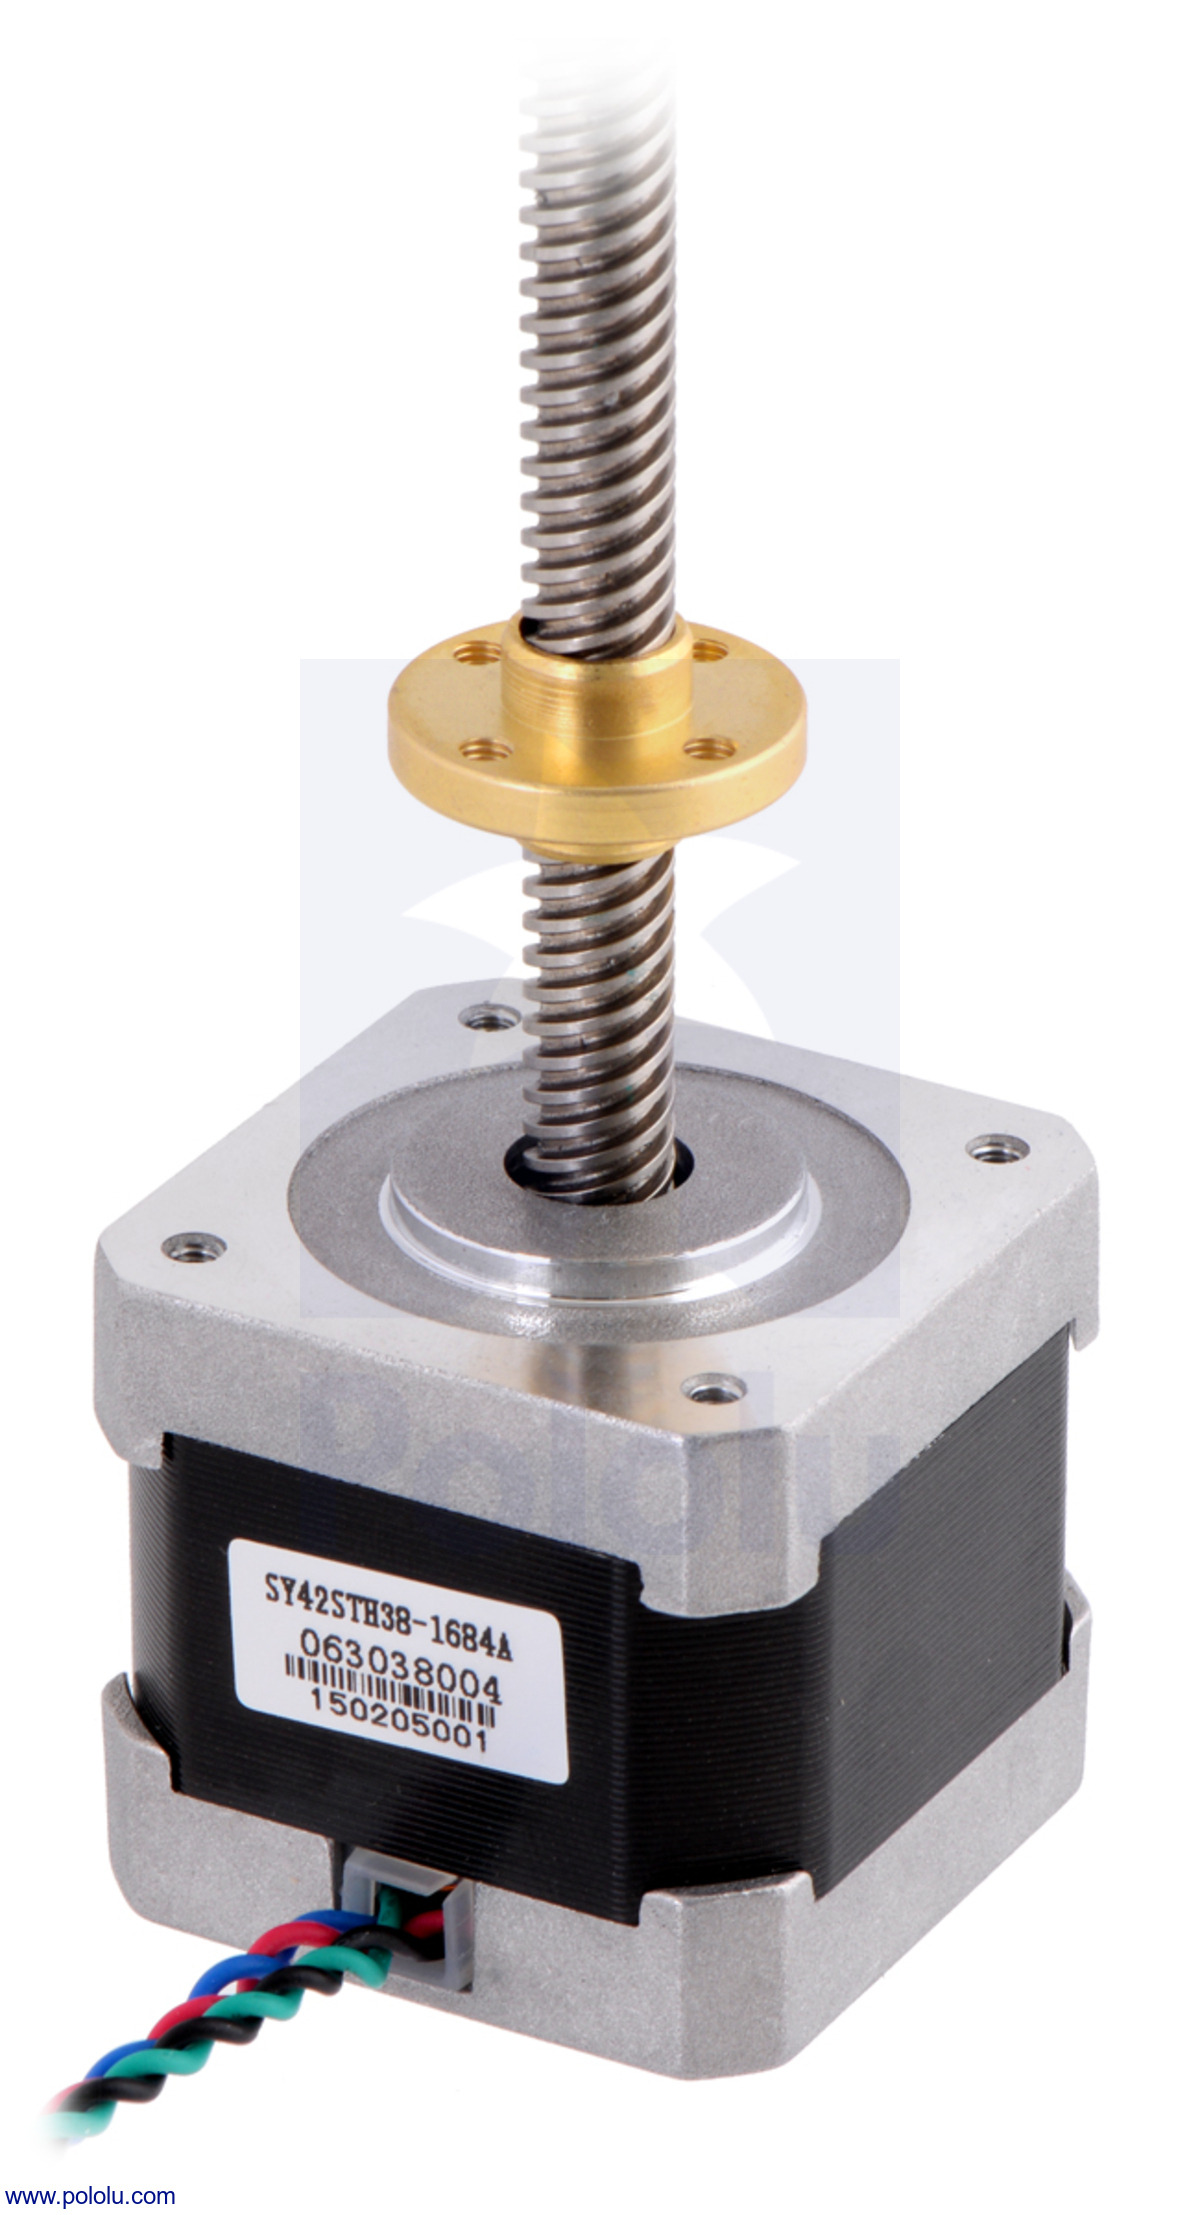 Kgcm 6 Wire Nema 17 Stepper Motor